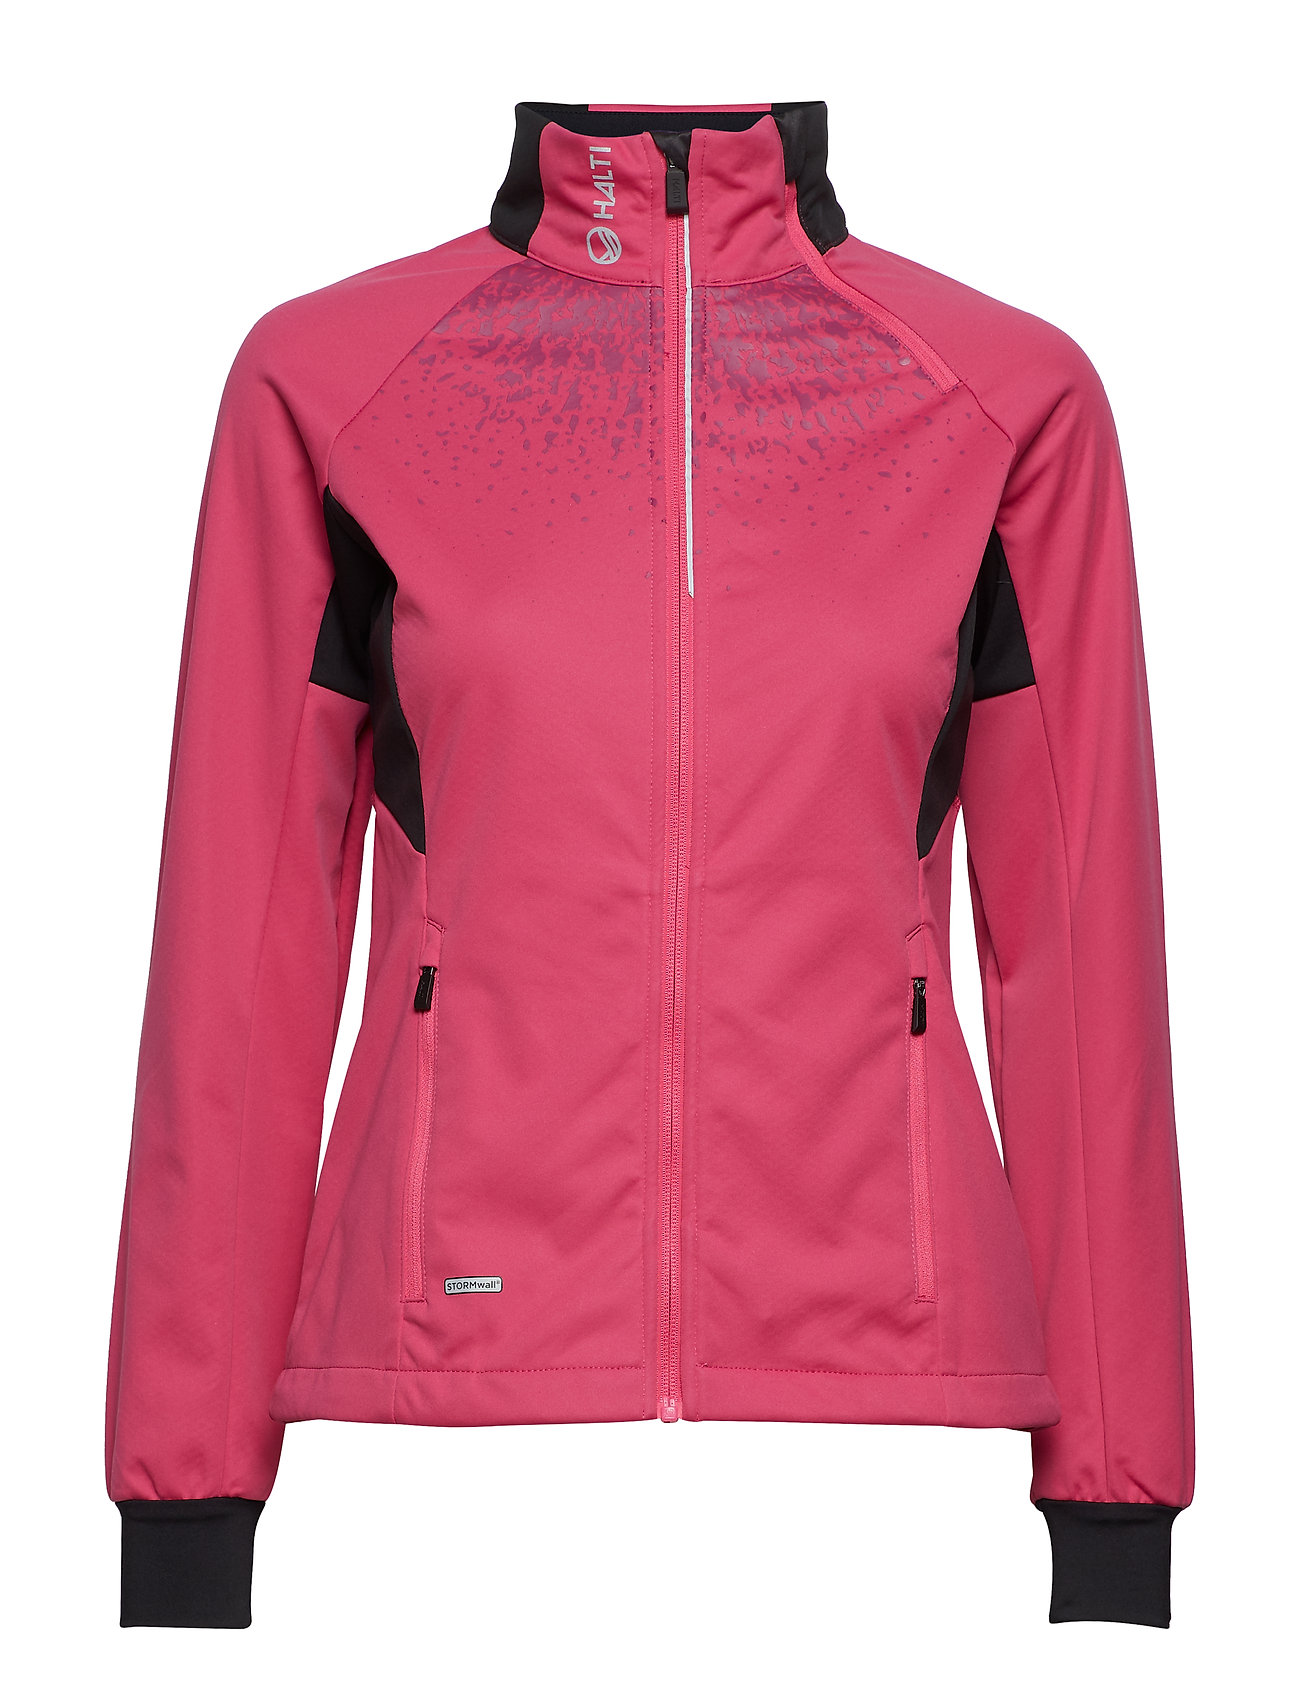 Halti Huurre W XCT jacket